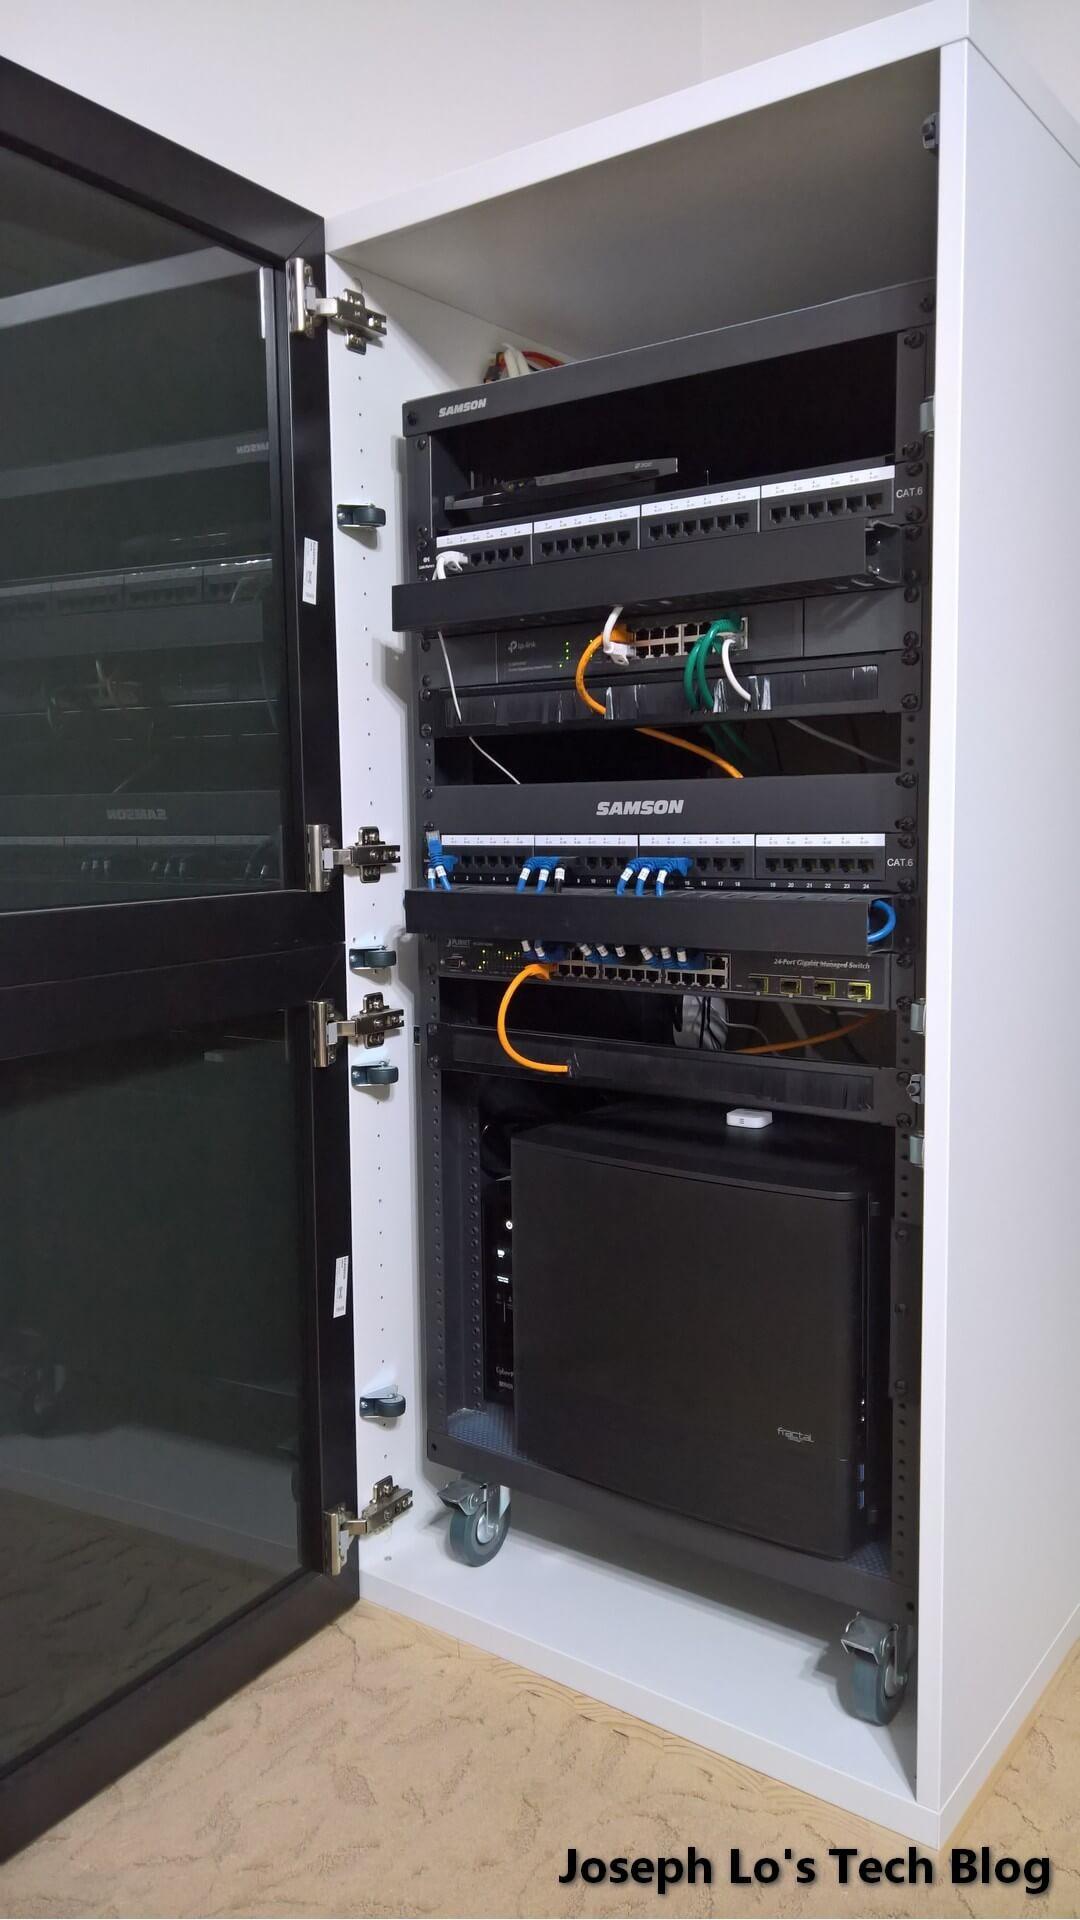 Computer Hoekkast Ikea.Diy Server Cabinet Using Ikea Parts Ikea Hackers